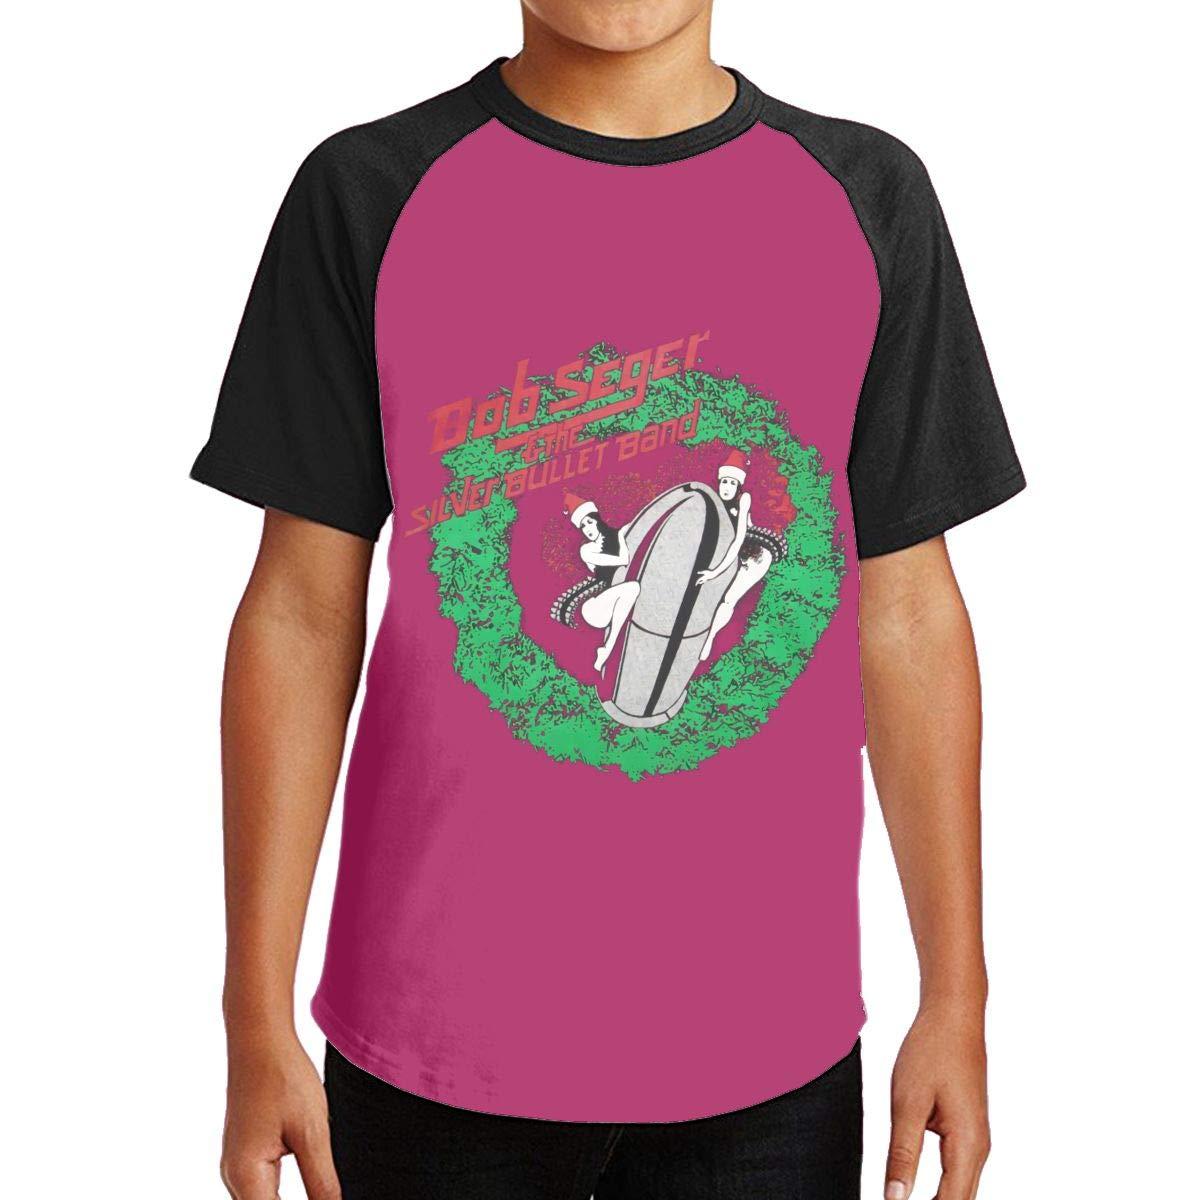 Bob Seger The Silver Bullet Band Comfortable Girls Crewneck Short Sleeve 2145 Shirts